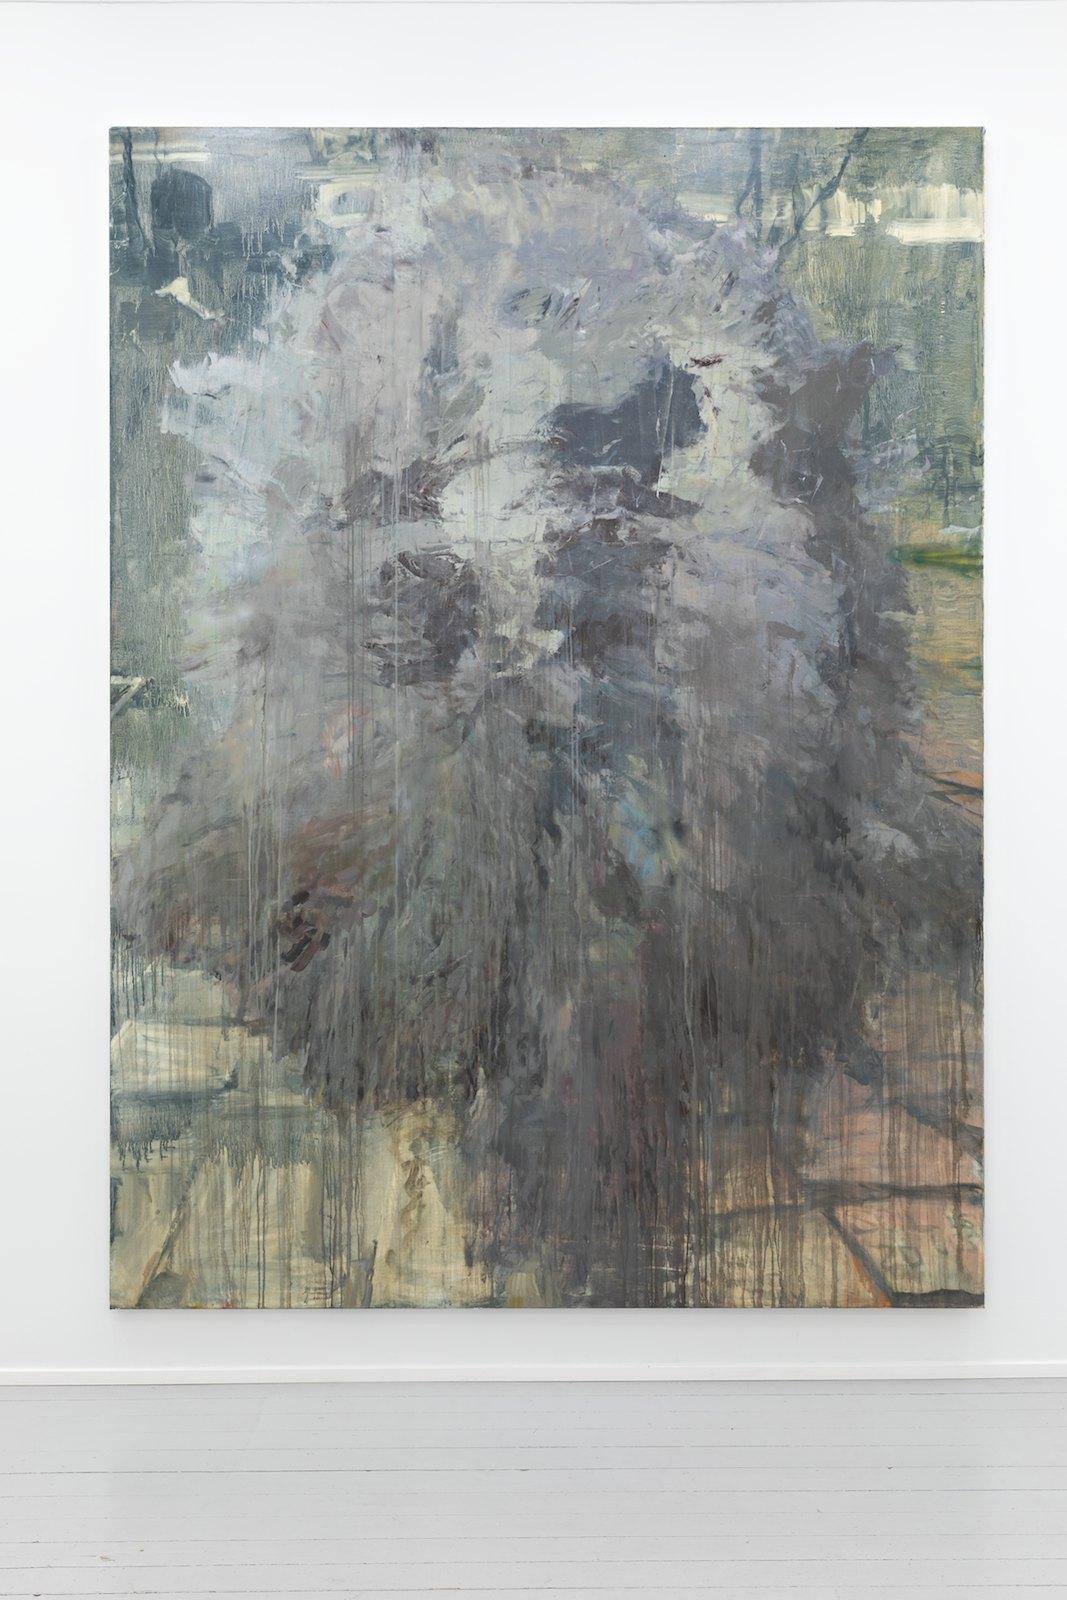 Bigger Half, flat, 2013. Oil on canvas, 274 x 203 cm